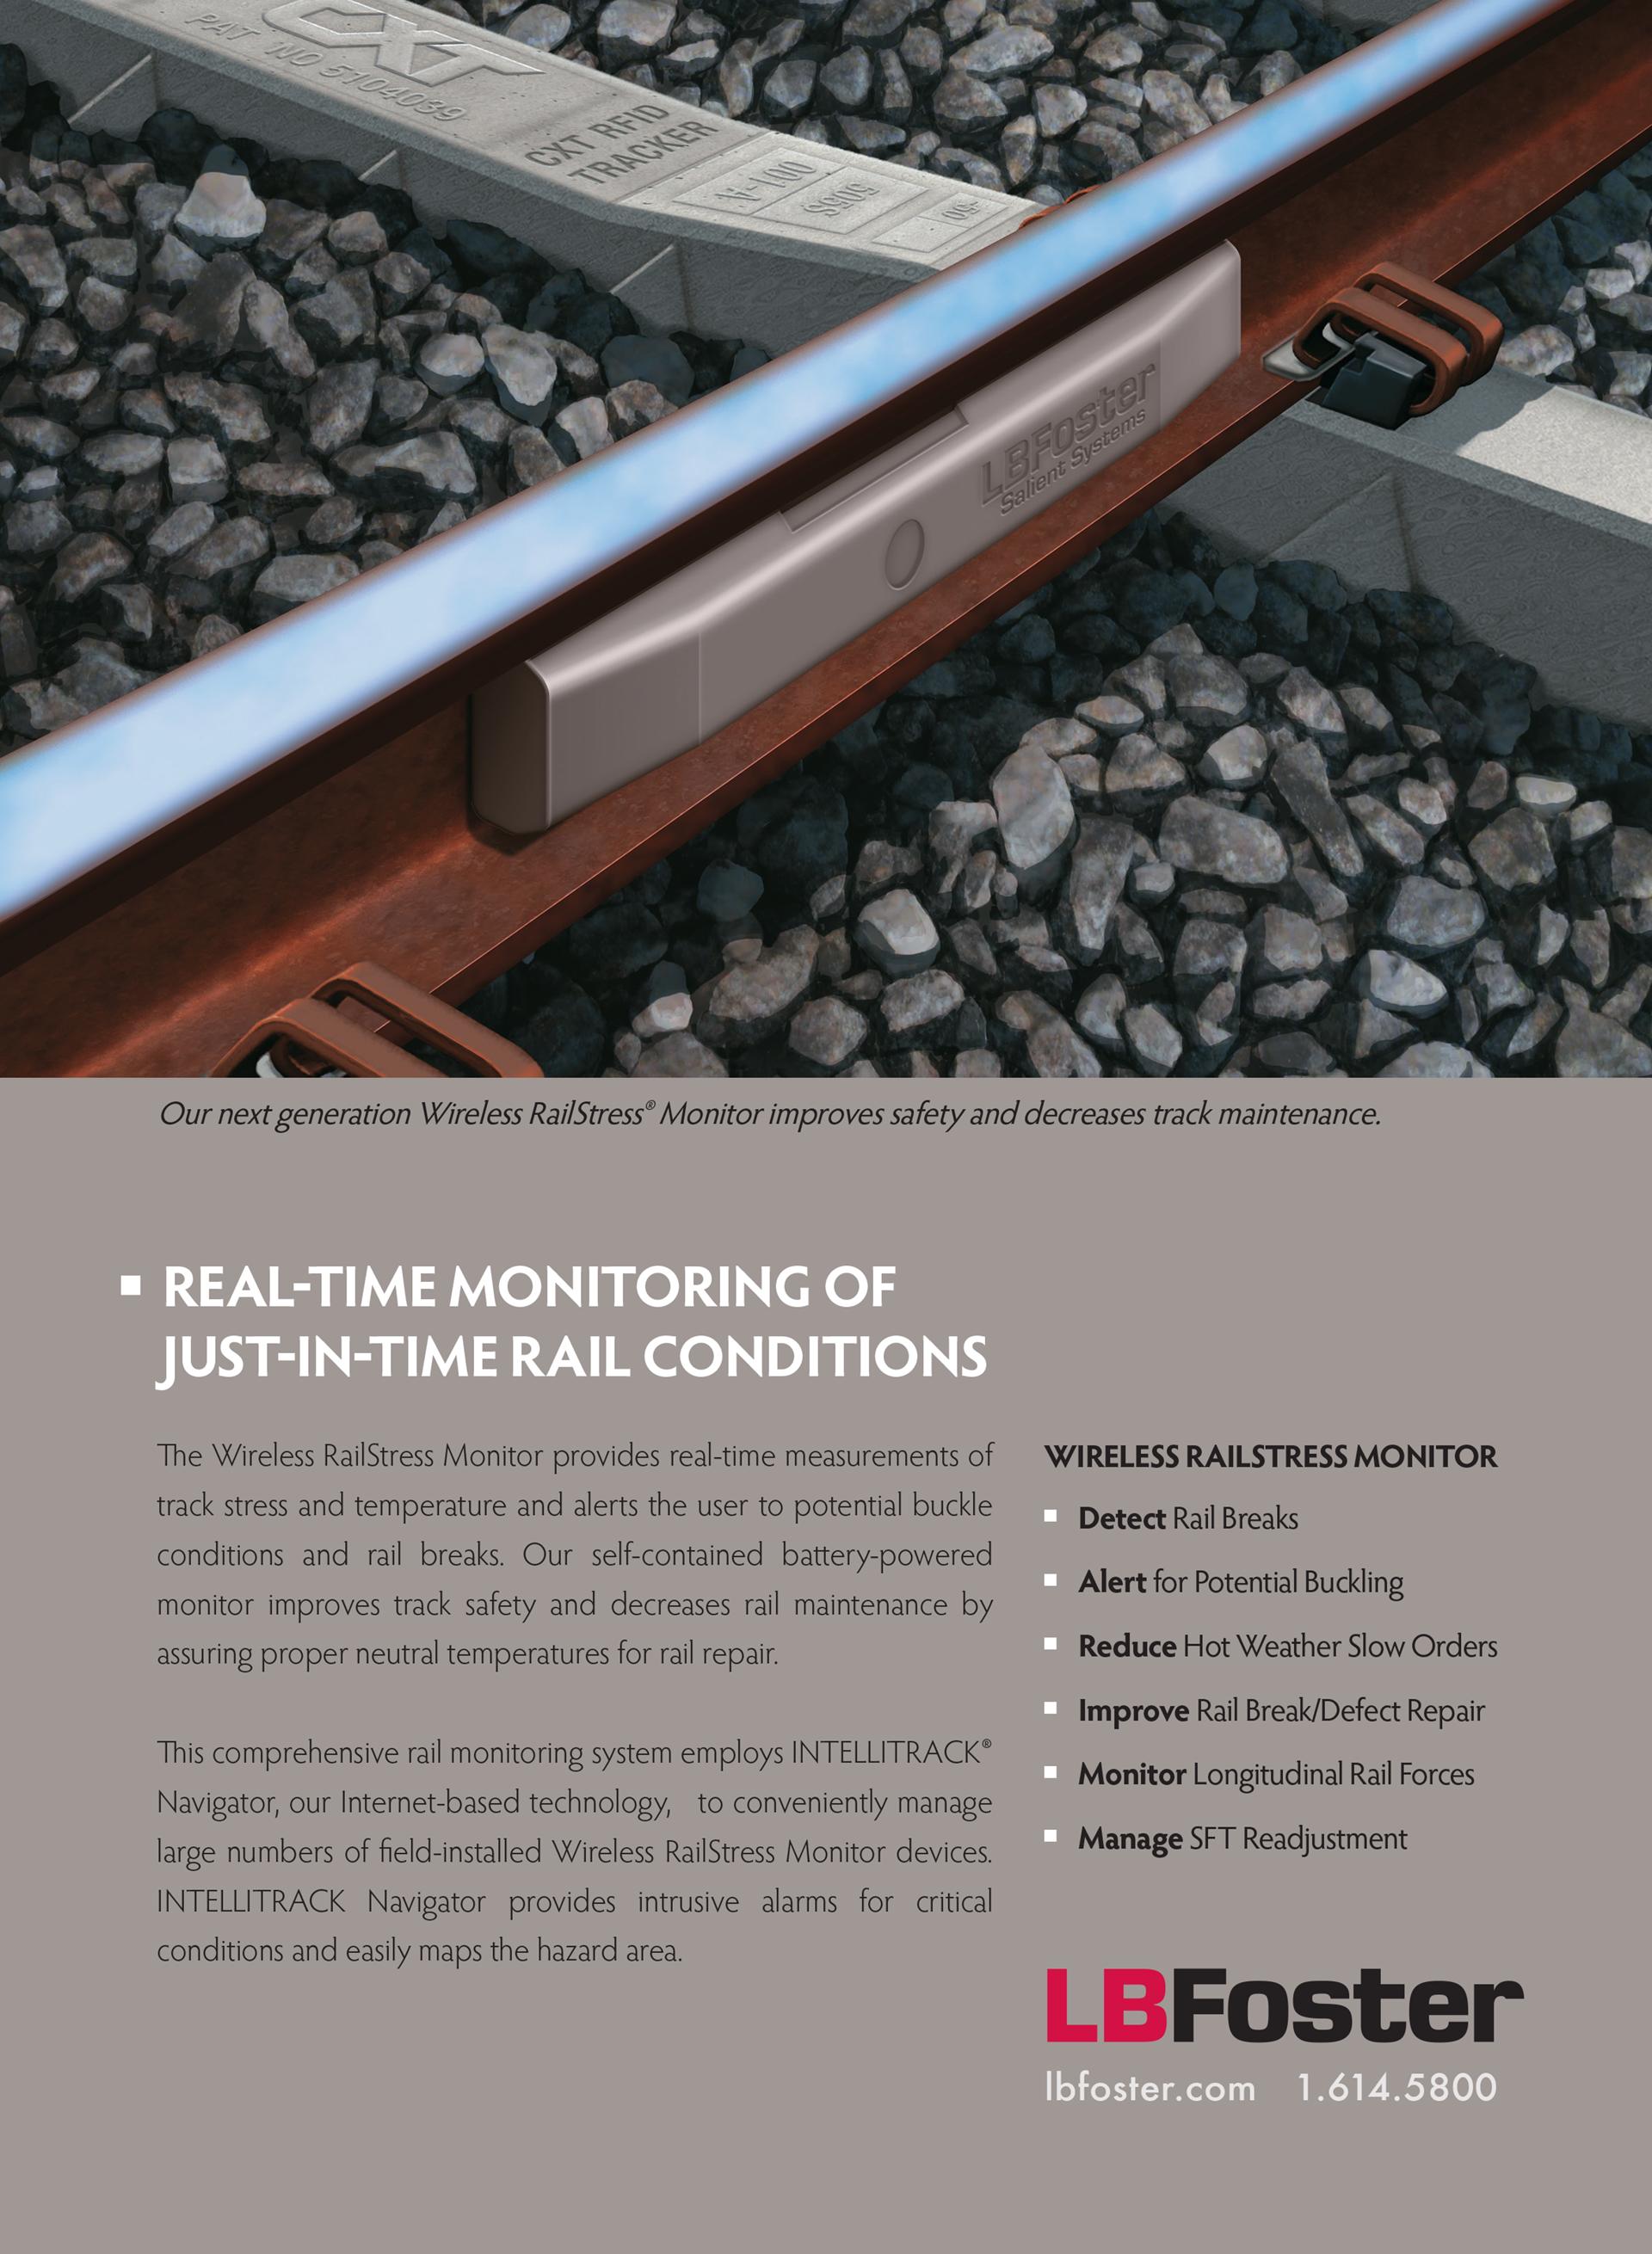 Rail Monitoring Systems, Rail Performance Monitor, Real-time Track Monitoring, Ninetimes, Illustration